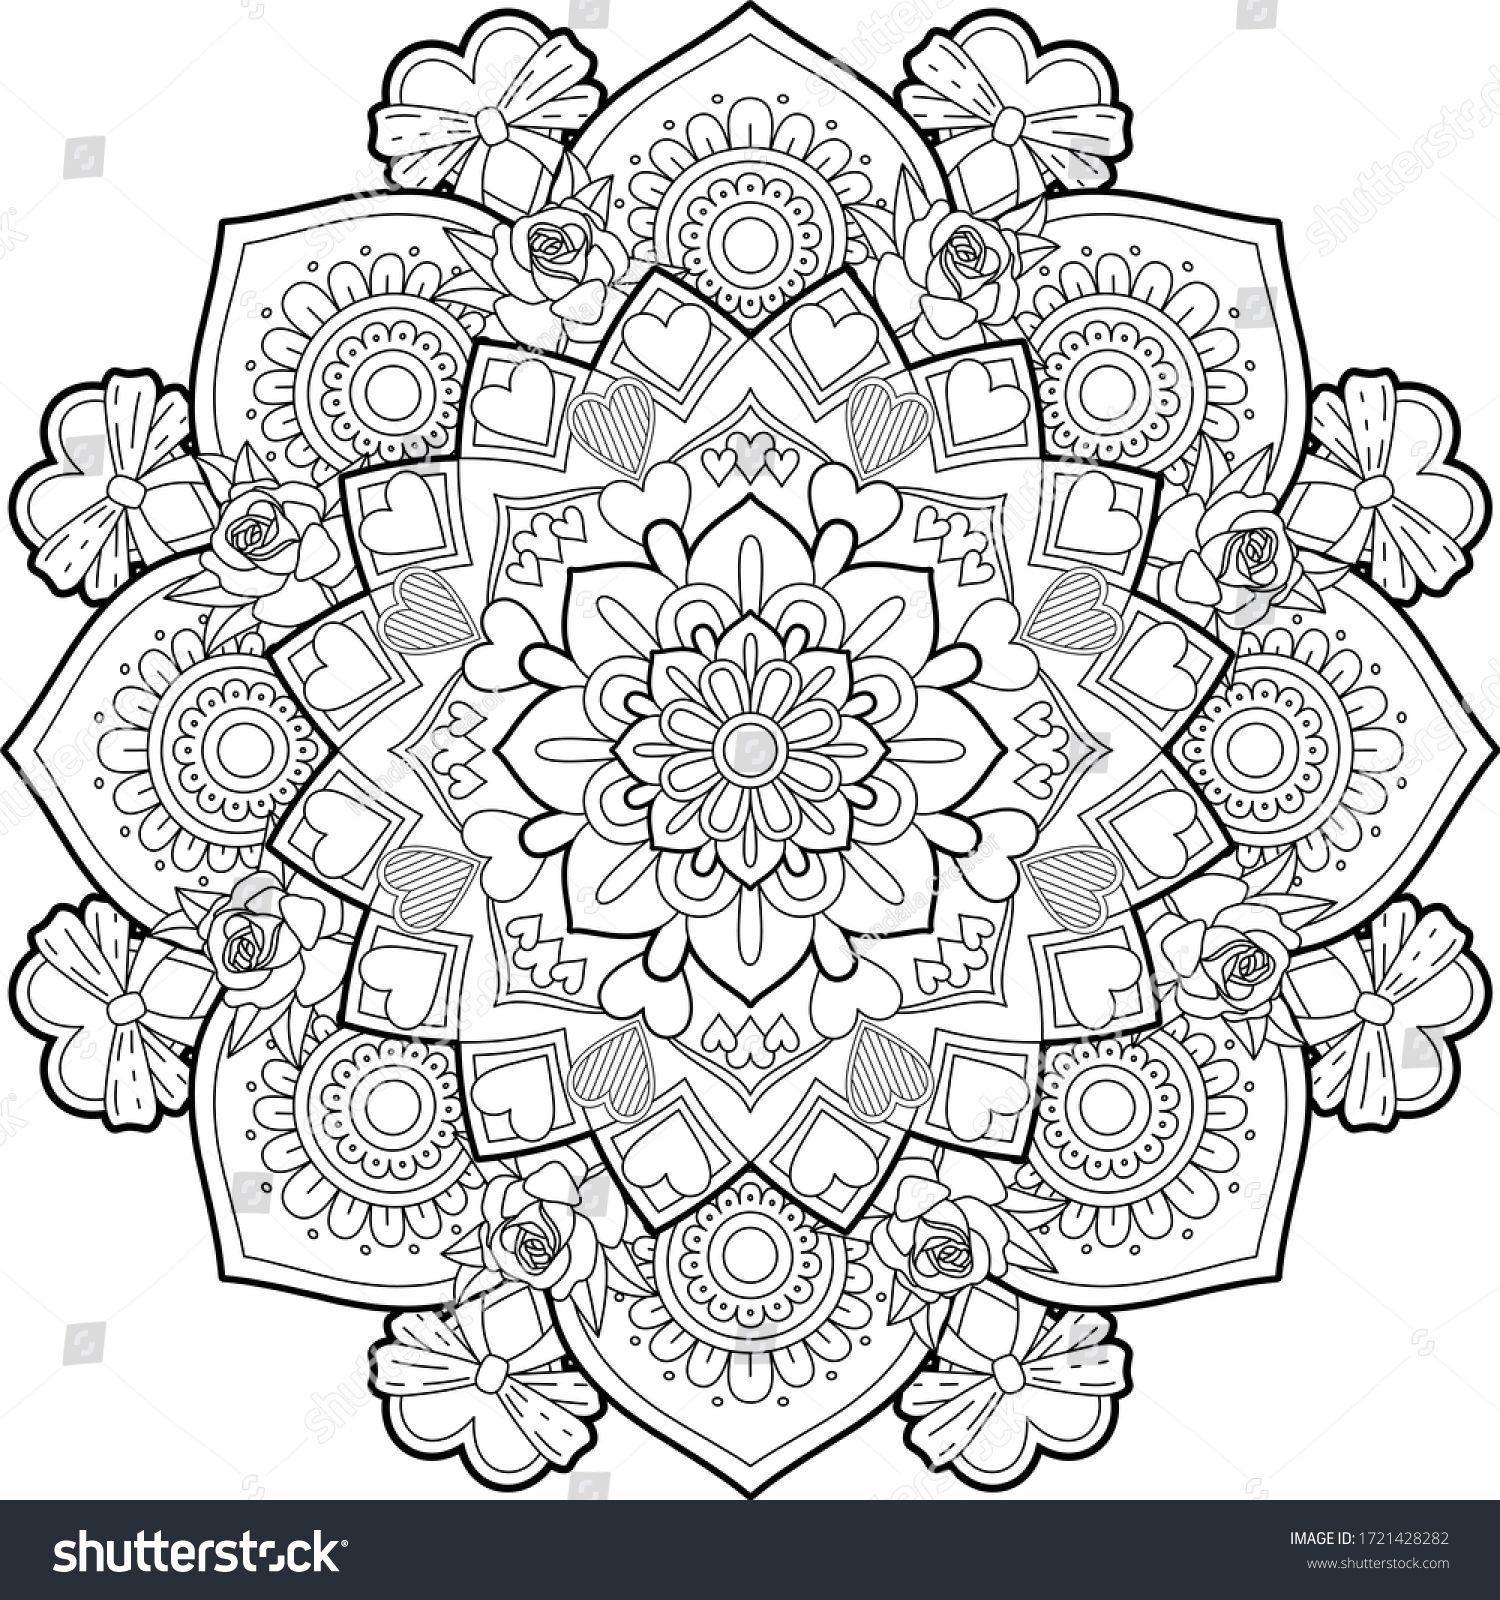 Hearts Roses Mandala Art Meditation Color ภาพประกอบสต อก 1721428282 ในป 2021 ม นดาลา ภาพประกอบ เล บ